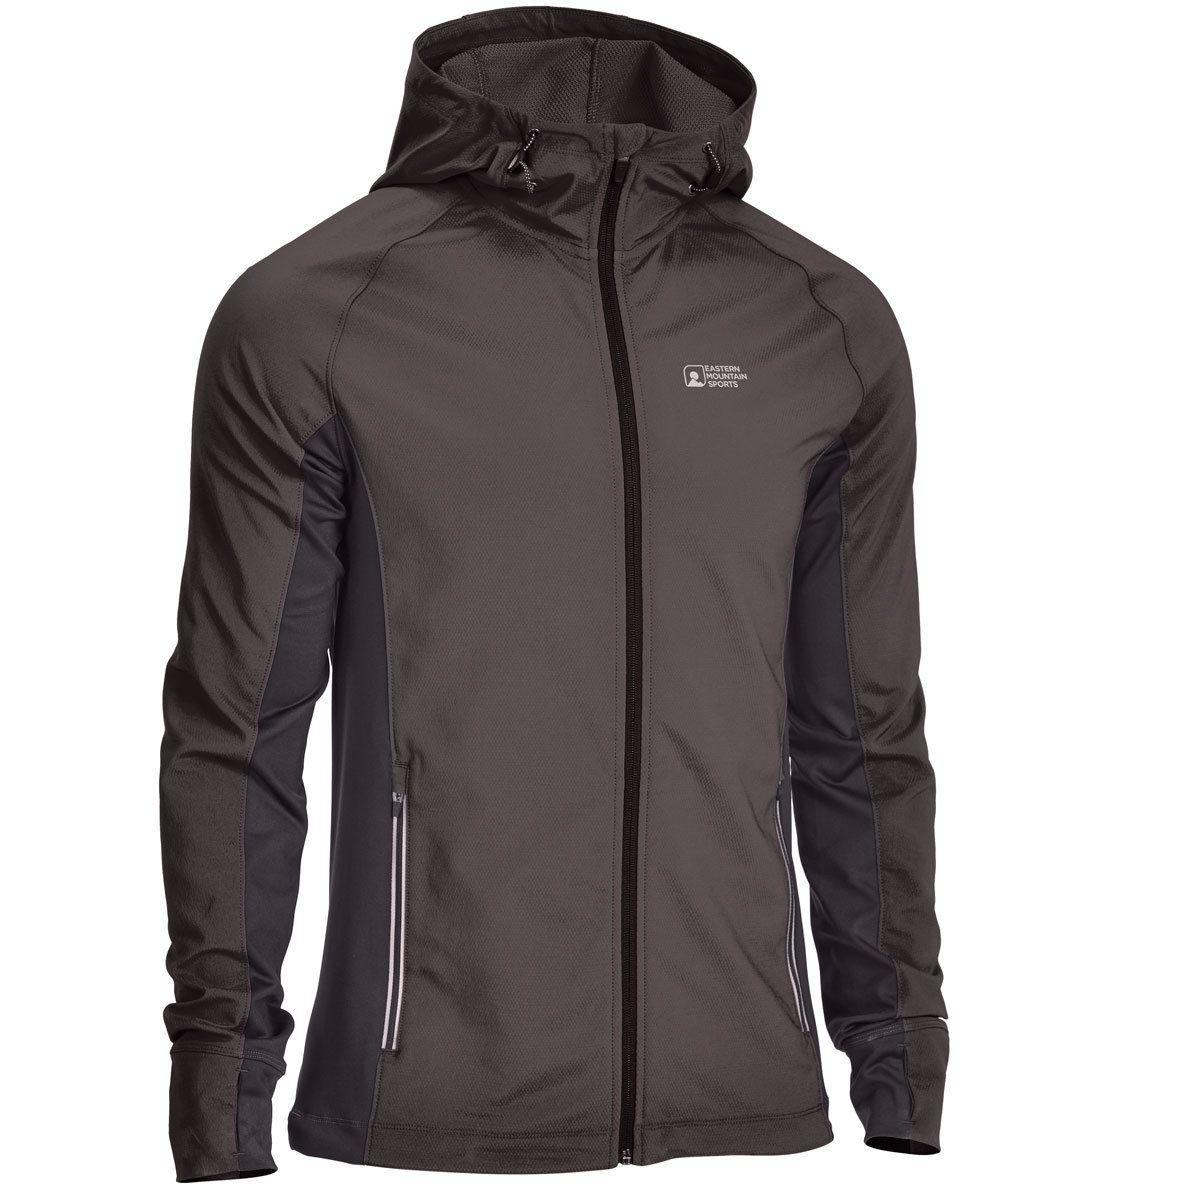 EMS Men's Techwick Active Hybrid Jacket Mens jacket